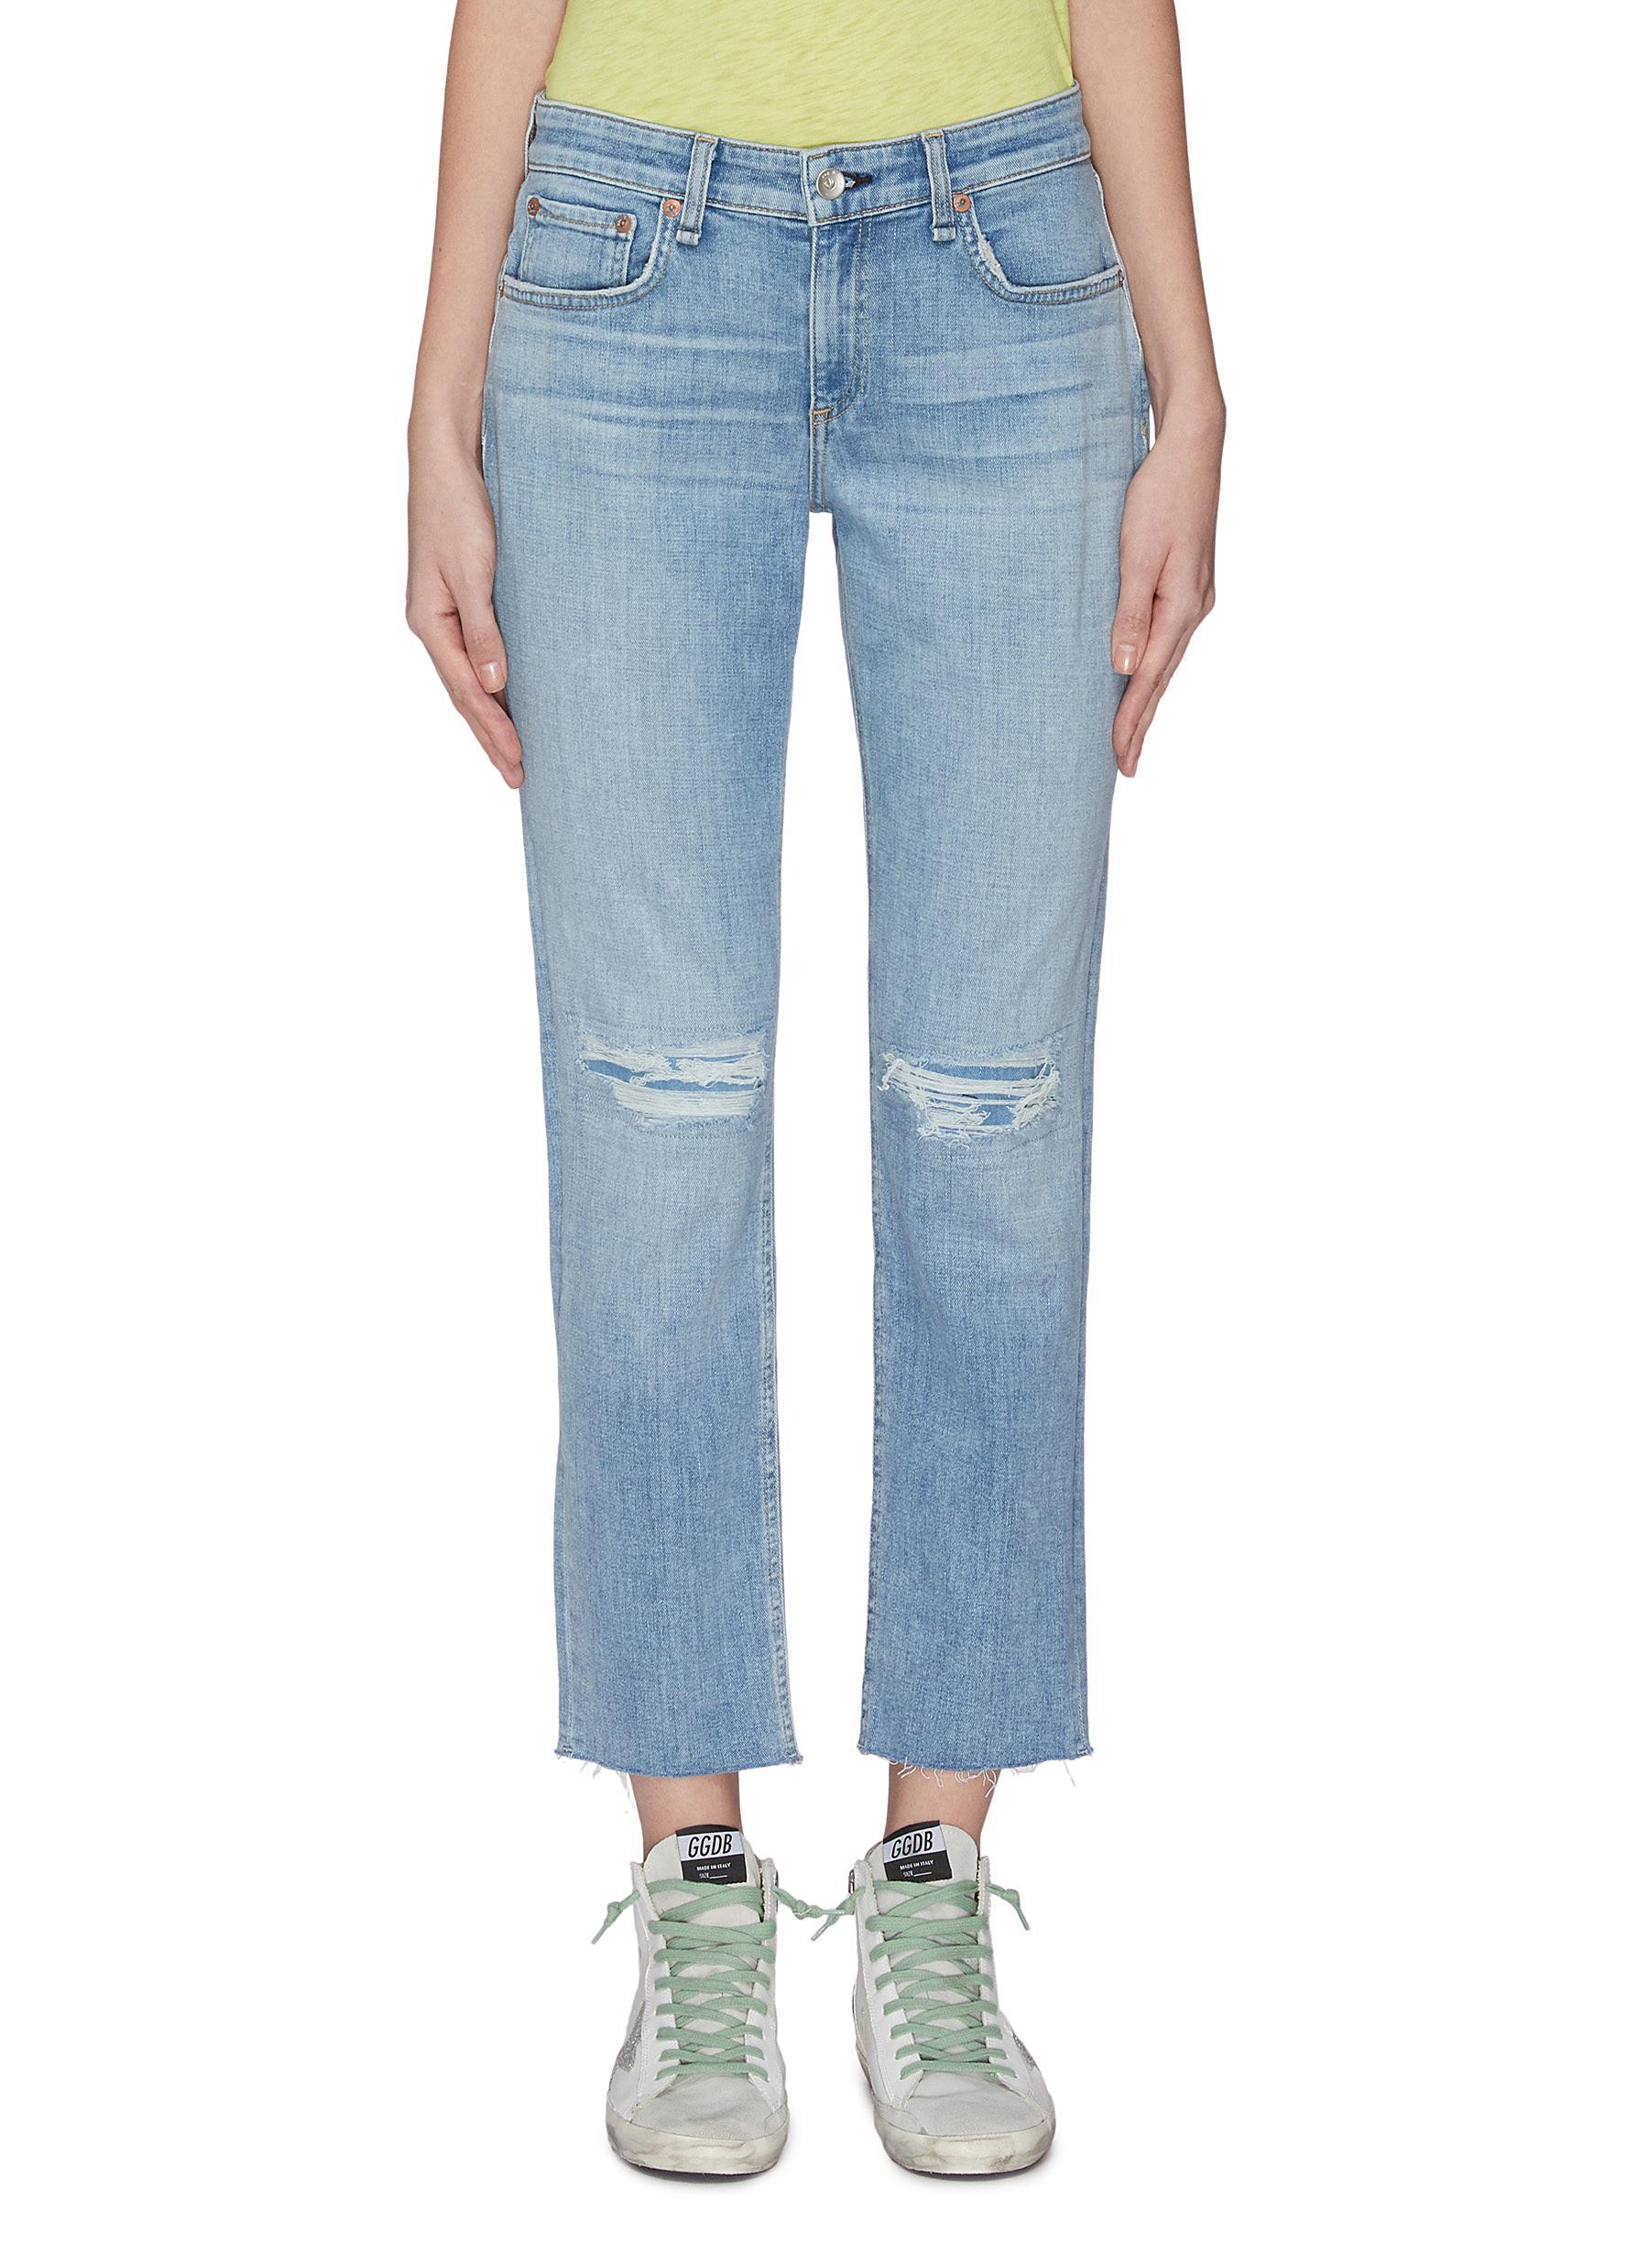 Buy Rag & Bone/Jean Jeans Rip knee slim boyfriend jeans